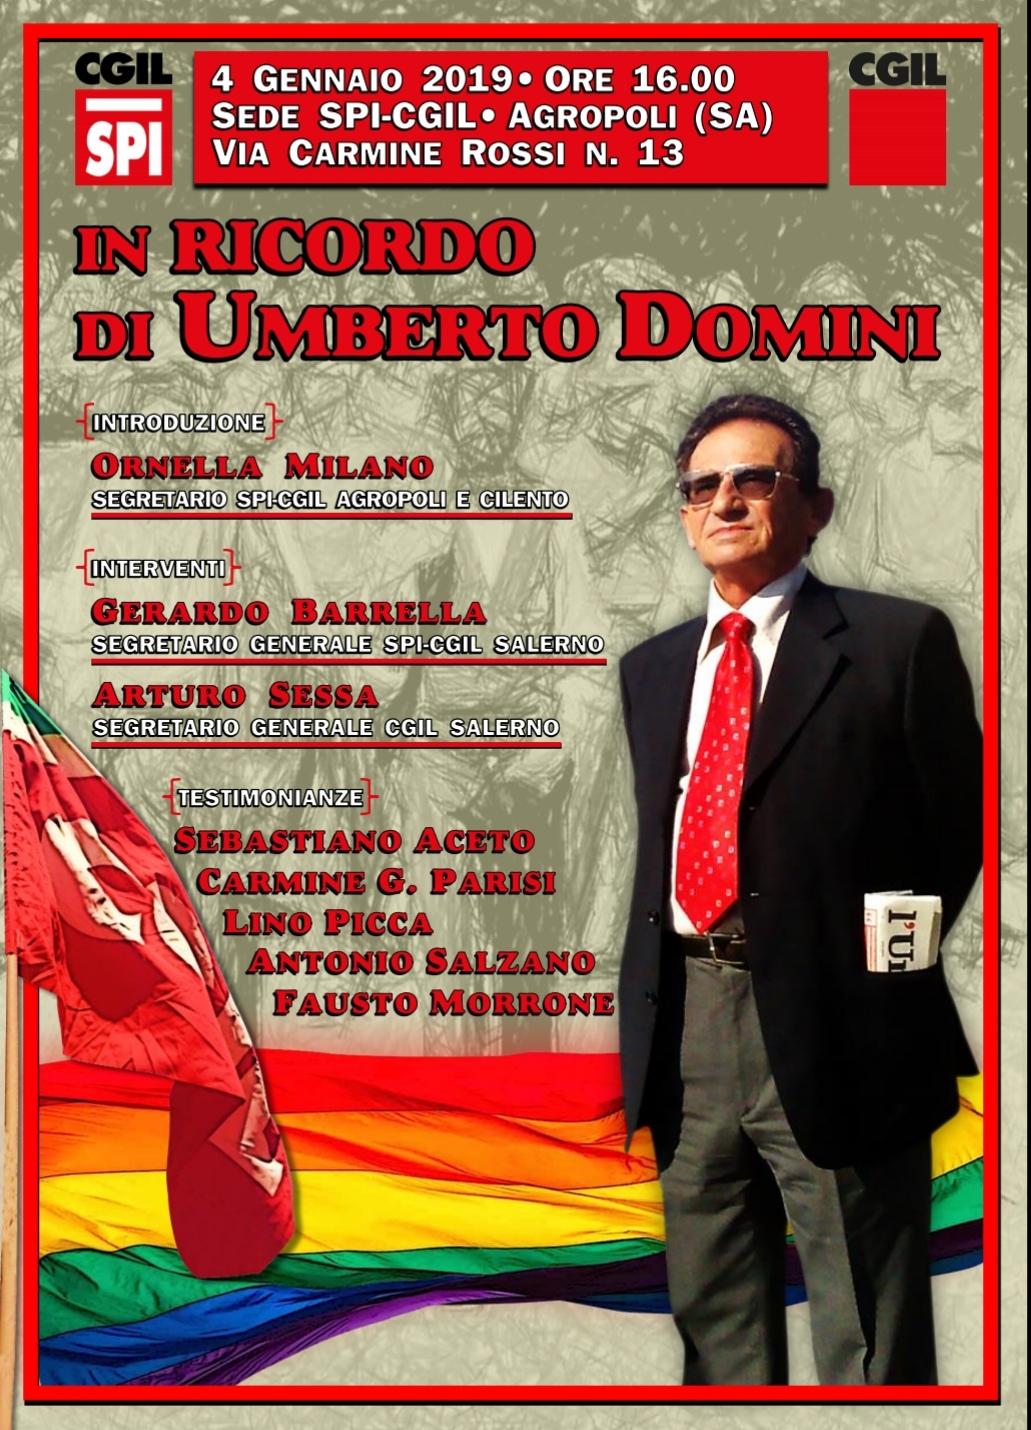 Umberto Domini